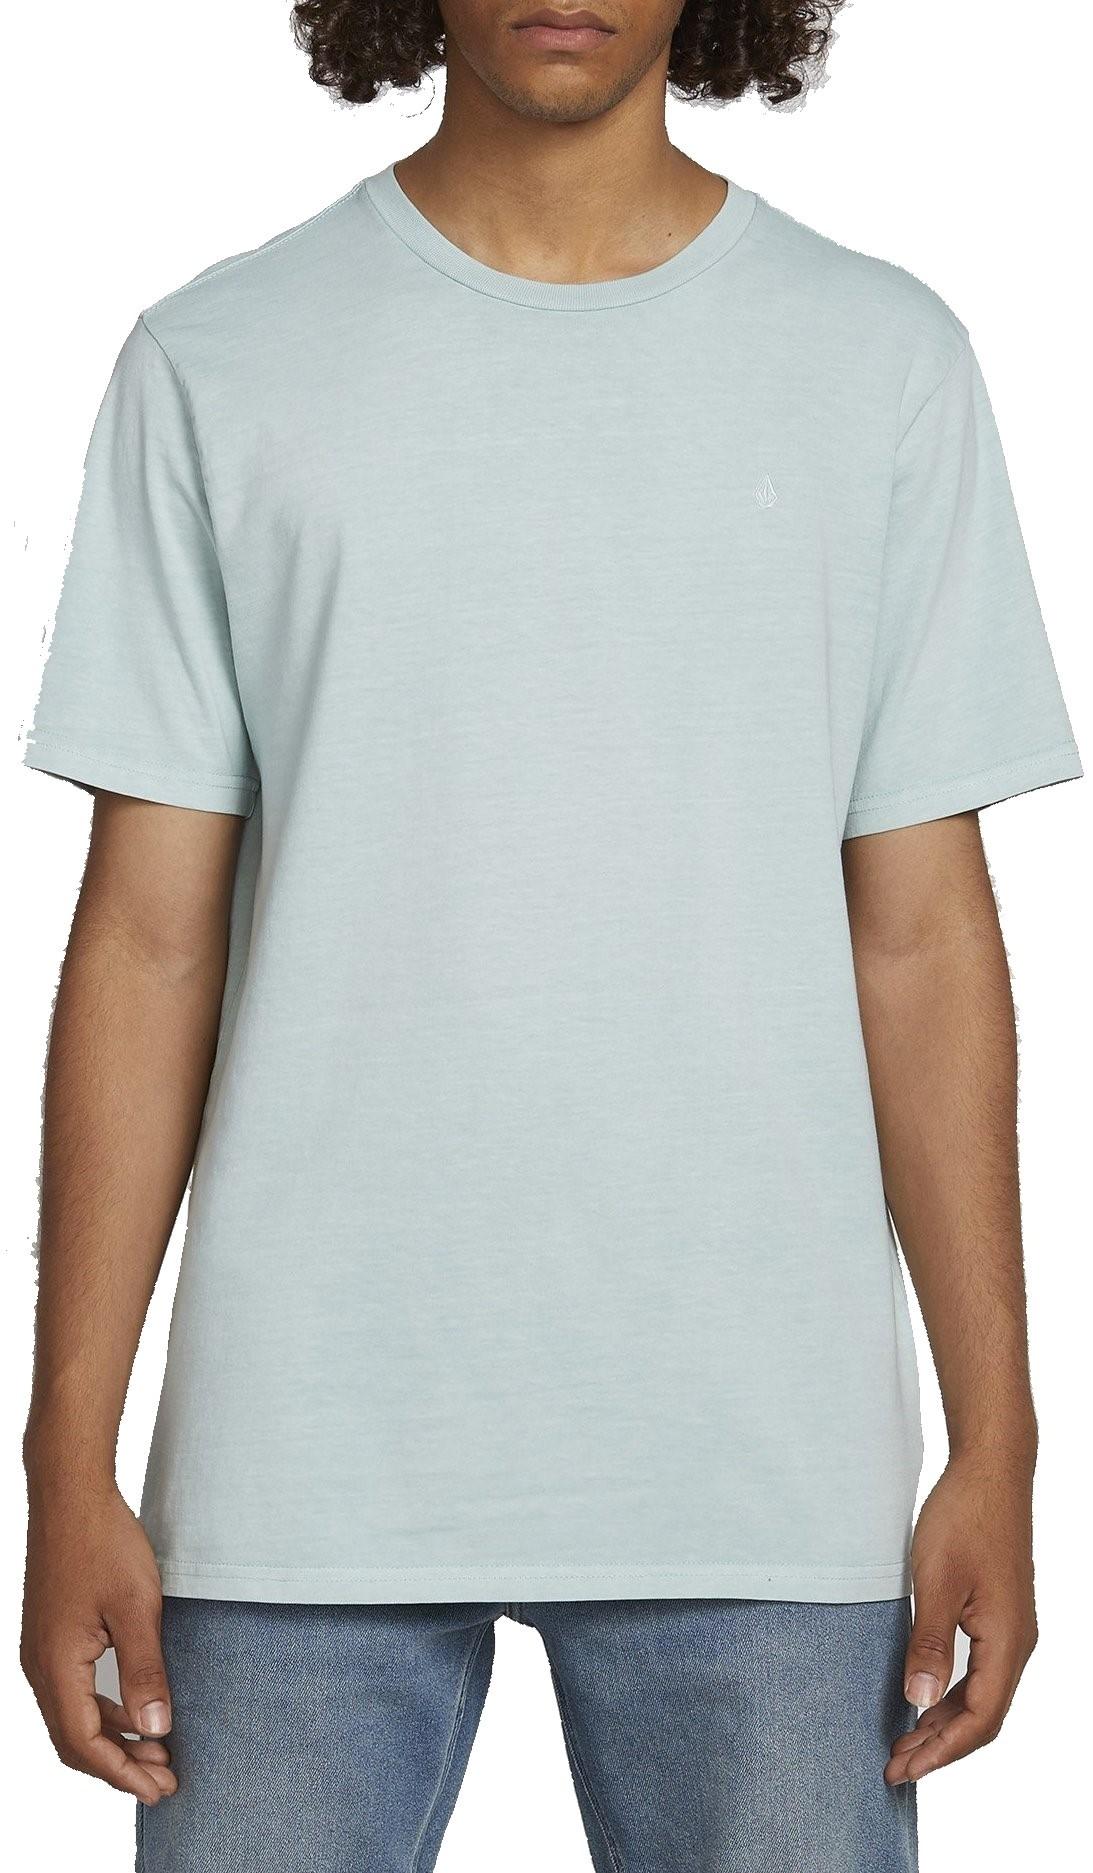 VOLCOM Herren T-Shirt Solid Stone Sea Glass Blue